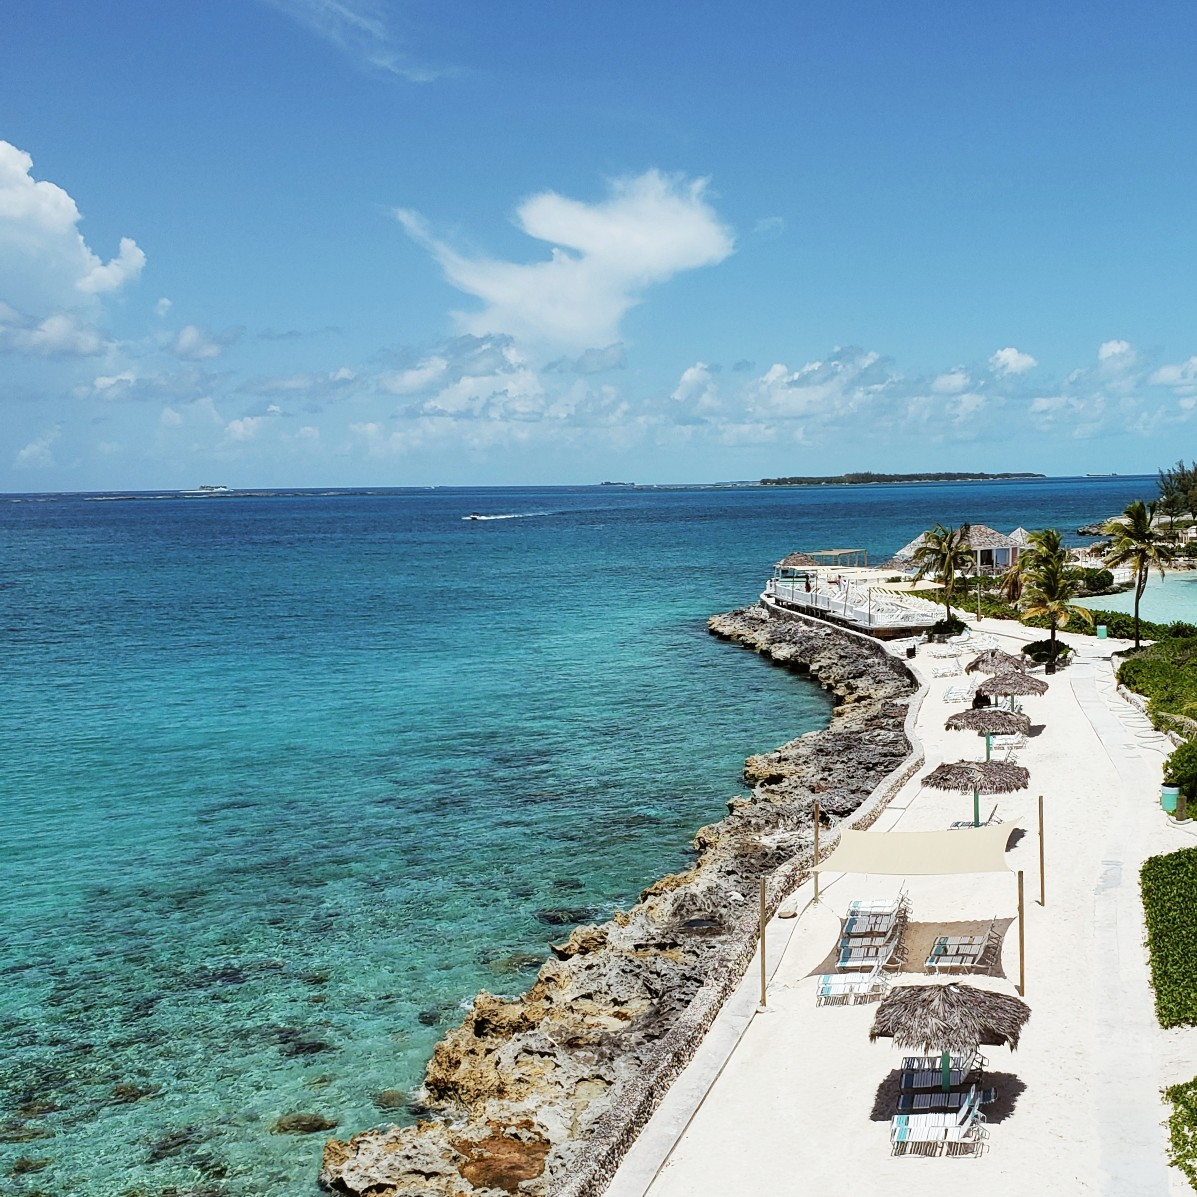 Teal Blue Water Pearl Island Bahamas